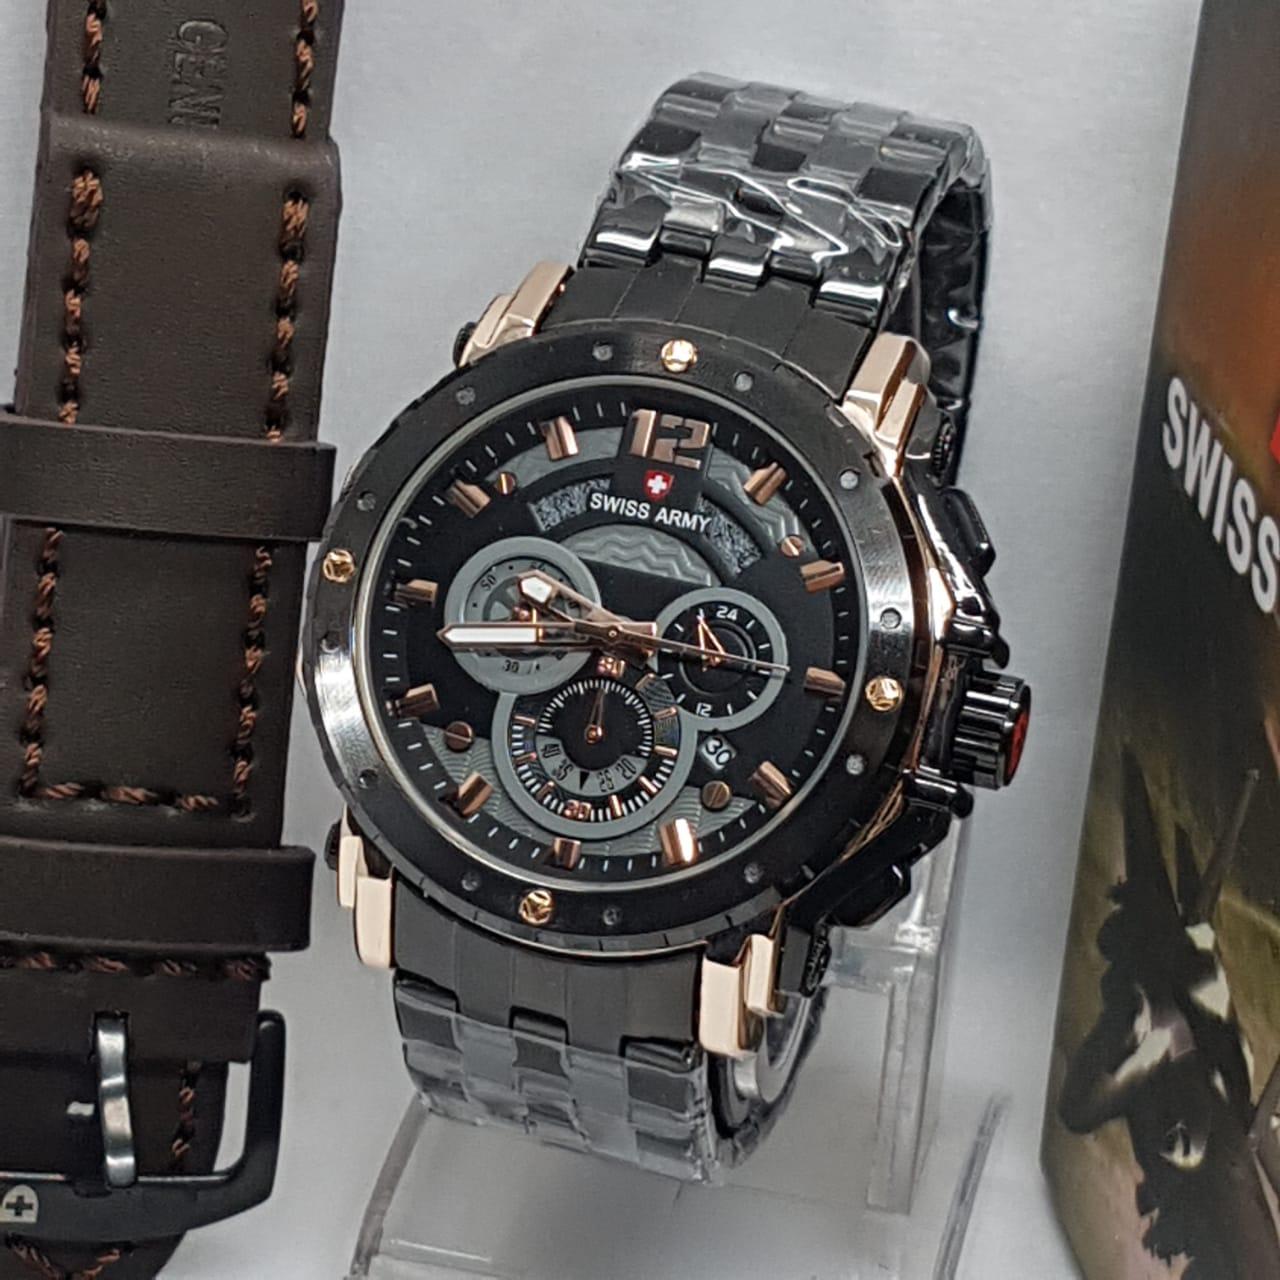 BISA BAYAR DI TEMPAT (COD) Jam Tangan pria Swiss Army ,jam tangan keren Limited edition, tali Rantai(Stainless stell) Crono Dan tanggal aktif, (free Tali Kulit & Box)